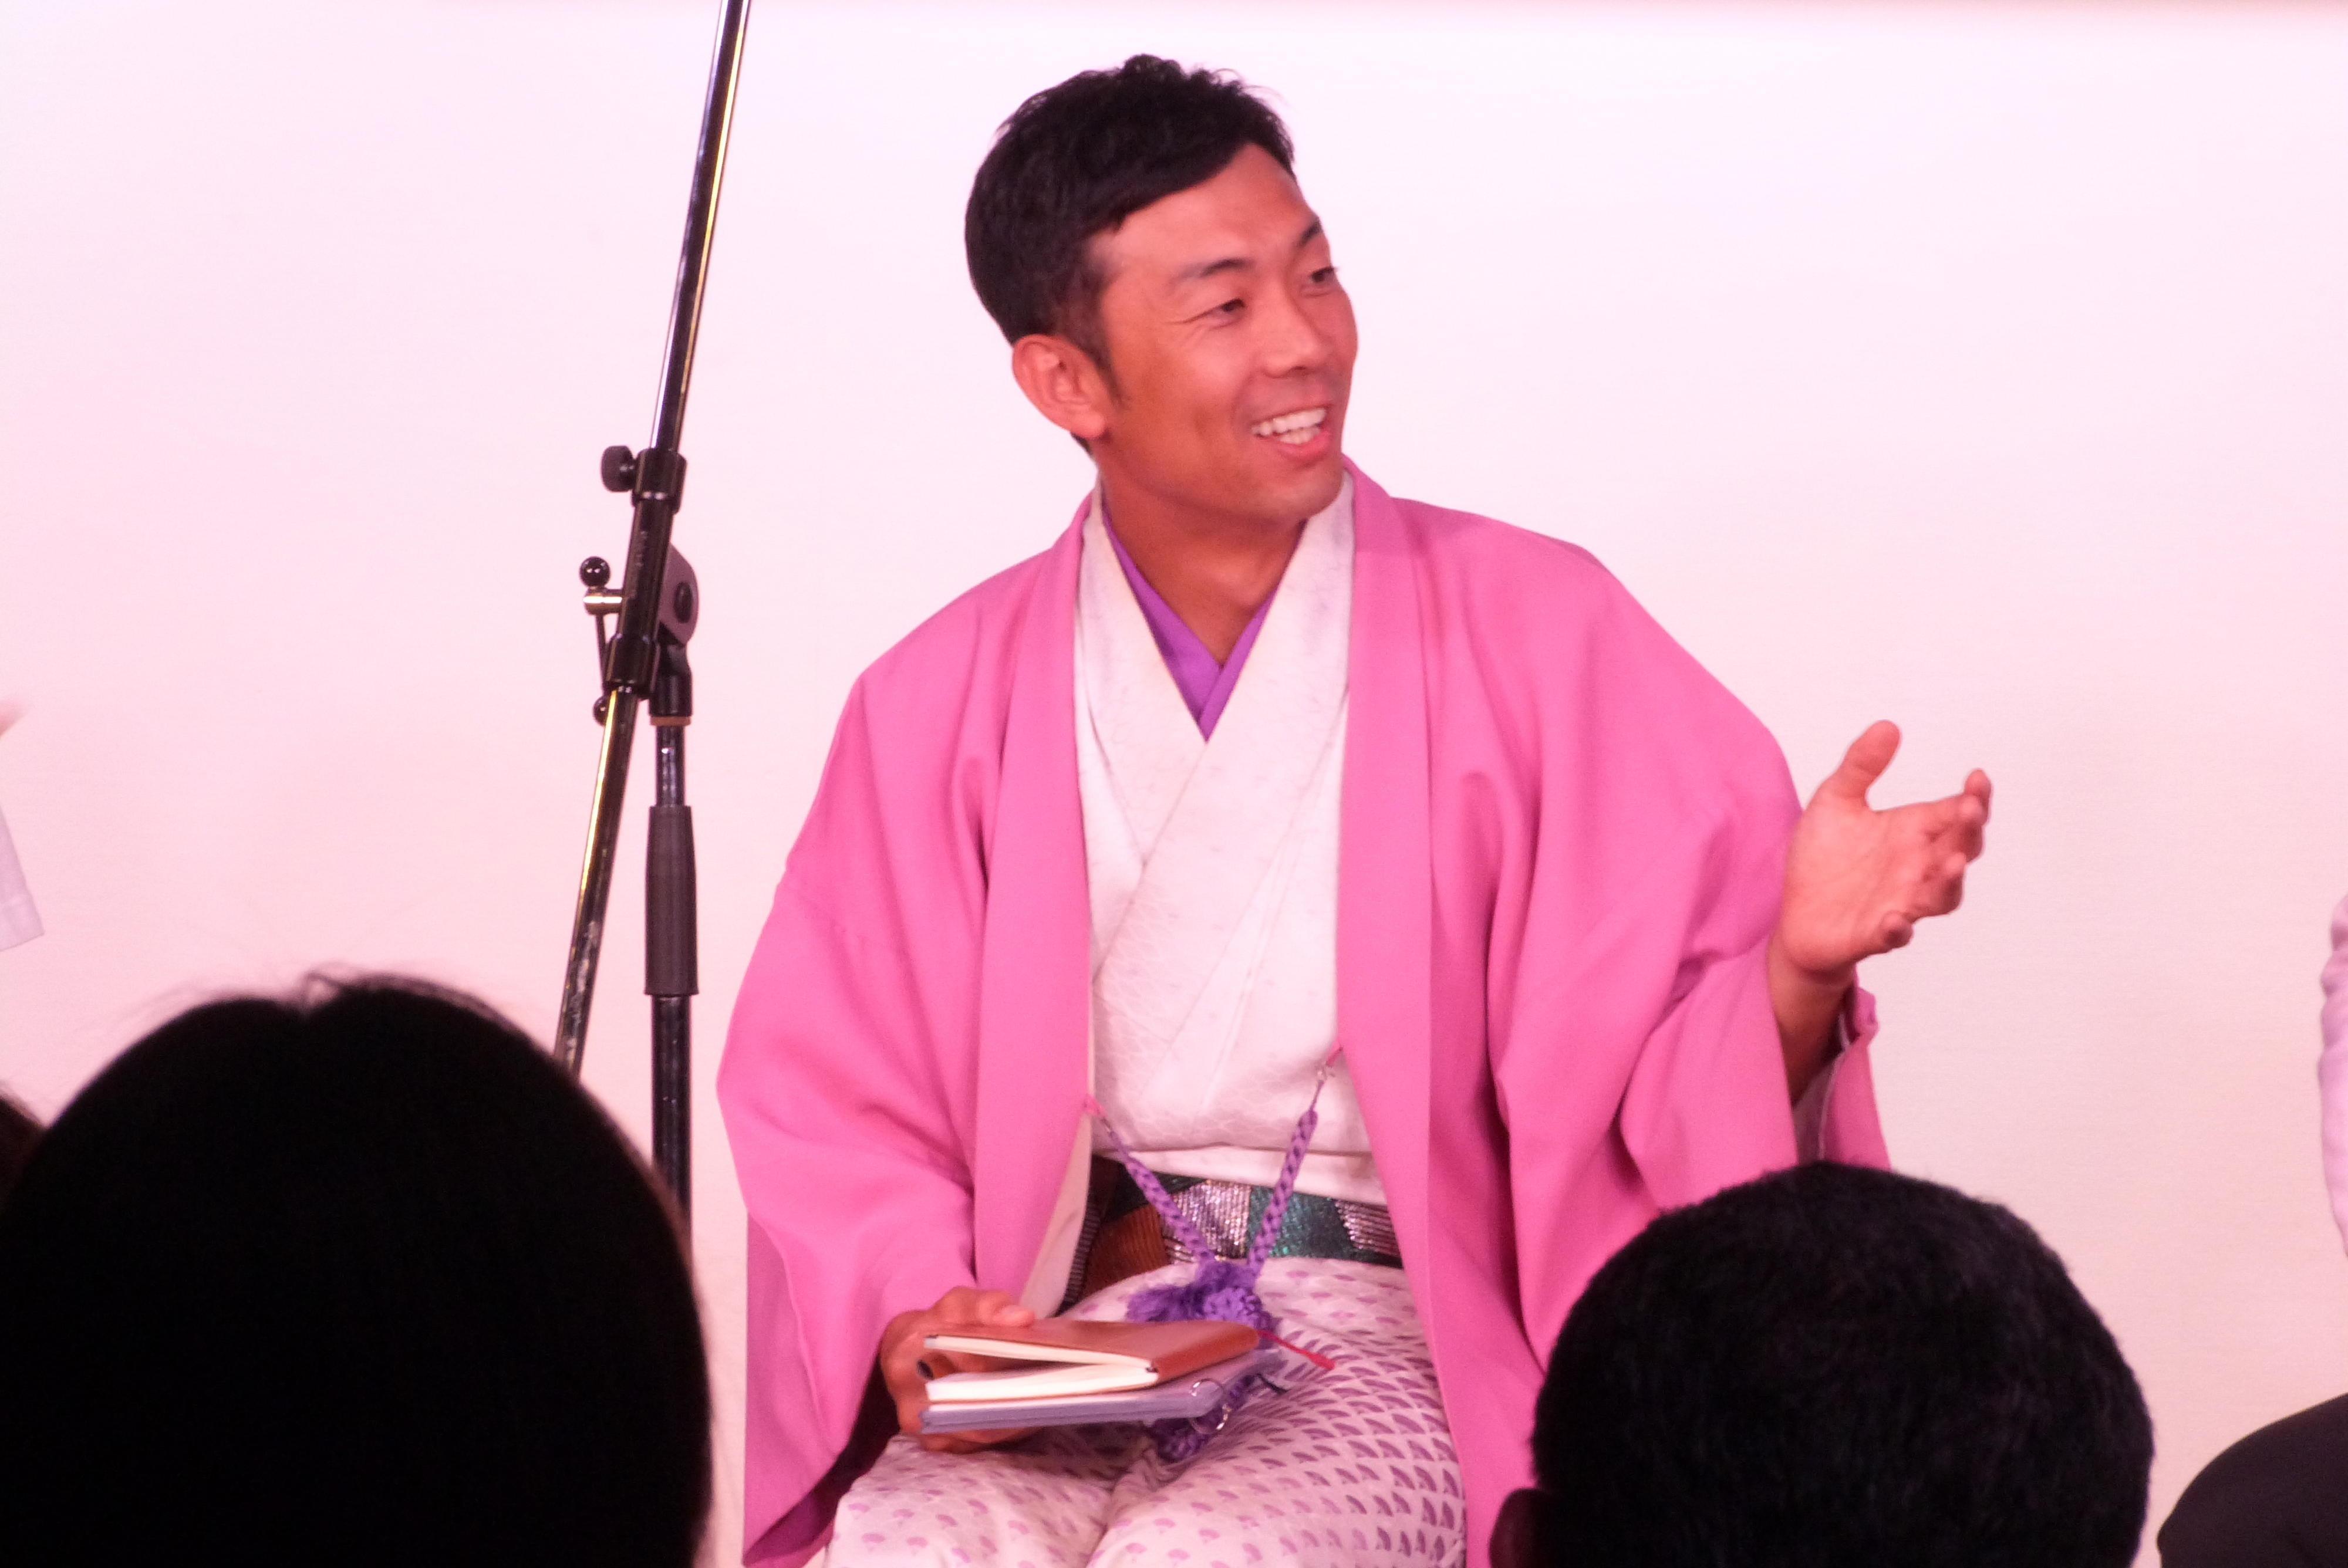 http://news.yoshimoto.co.jp/20180822204015-7cffc55dce713820fe5a20f9a47c0d1363a8f937.jpg